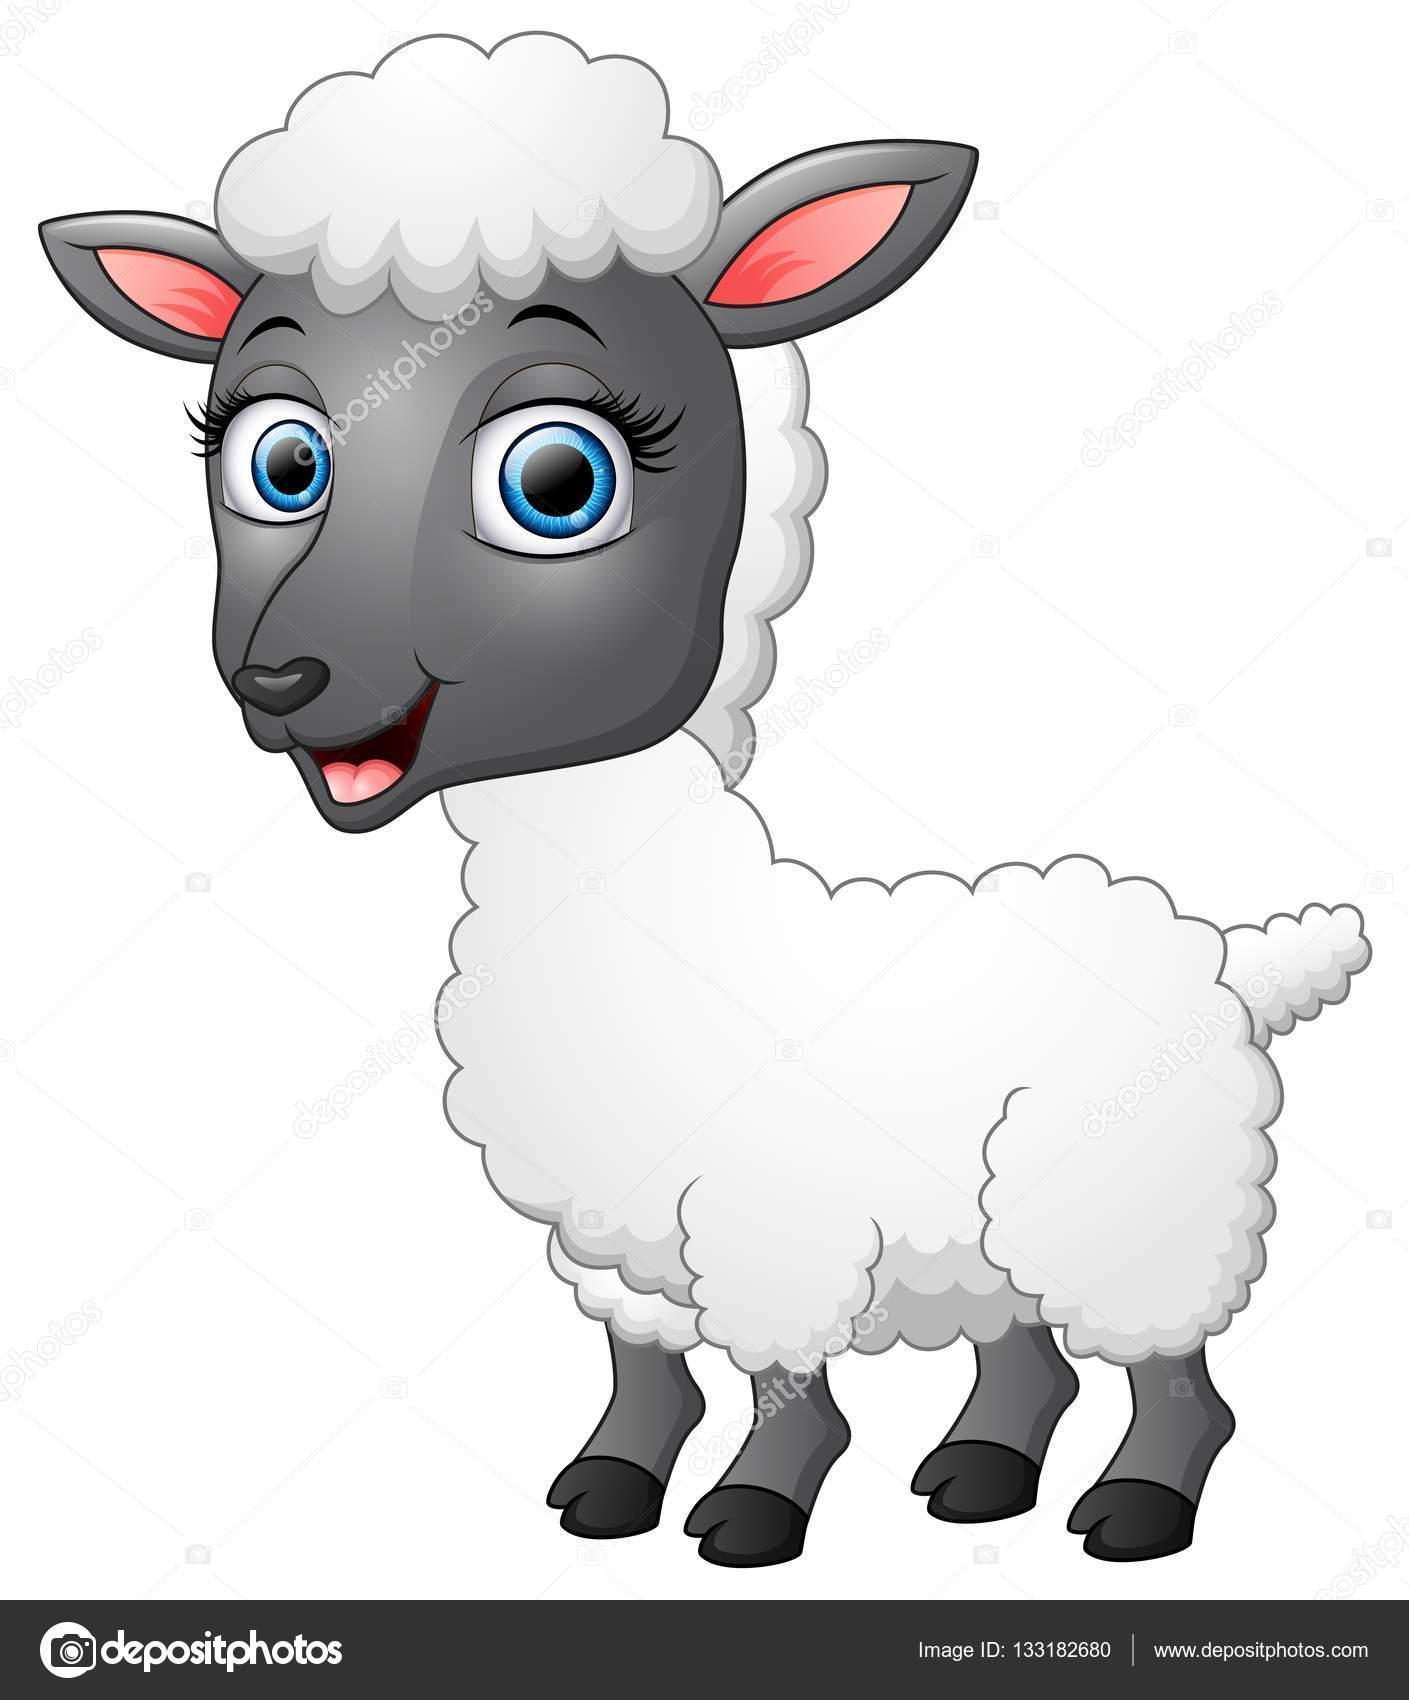 9 Best Goat cartoon images in 2018  Goat art Farm